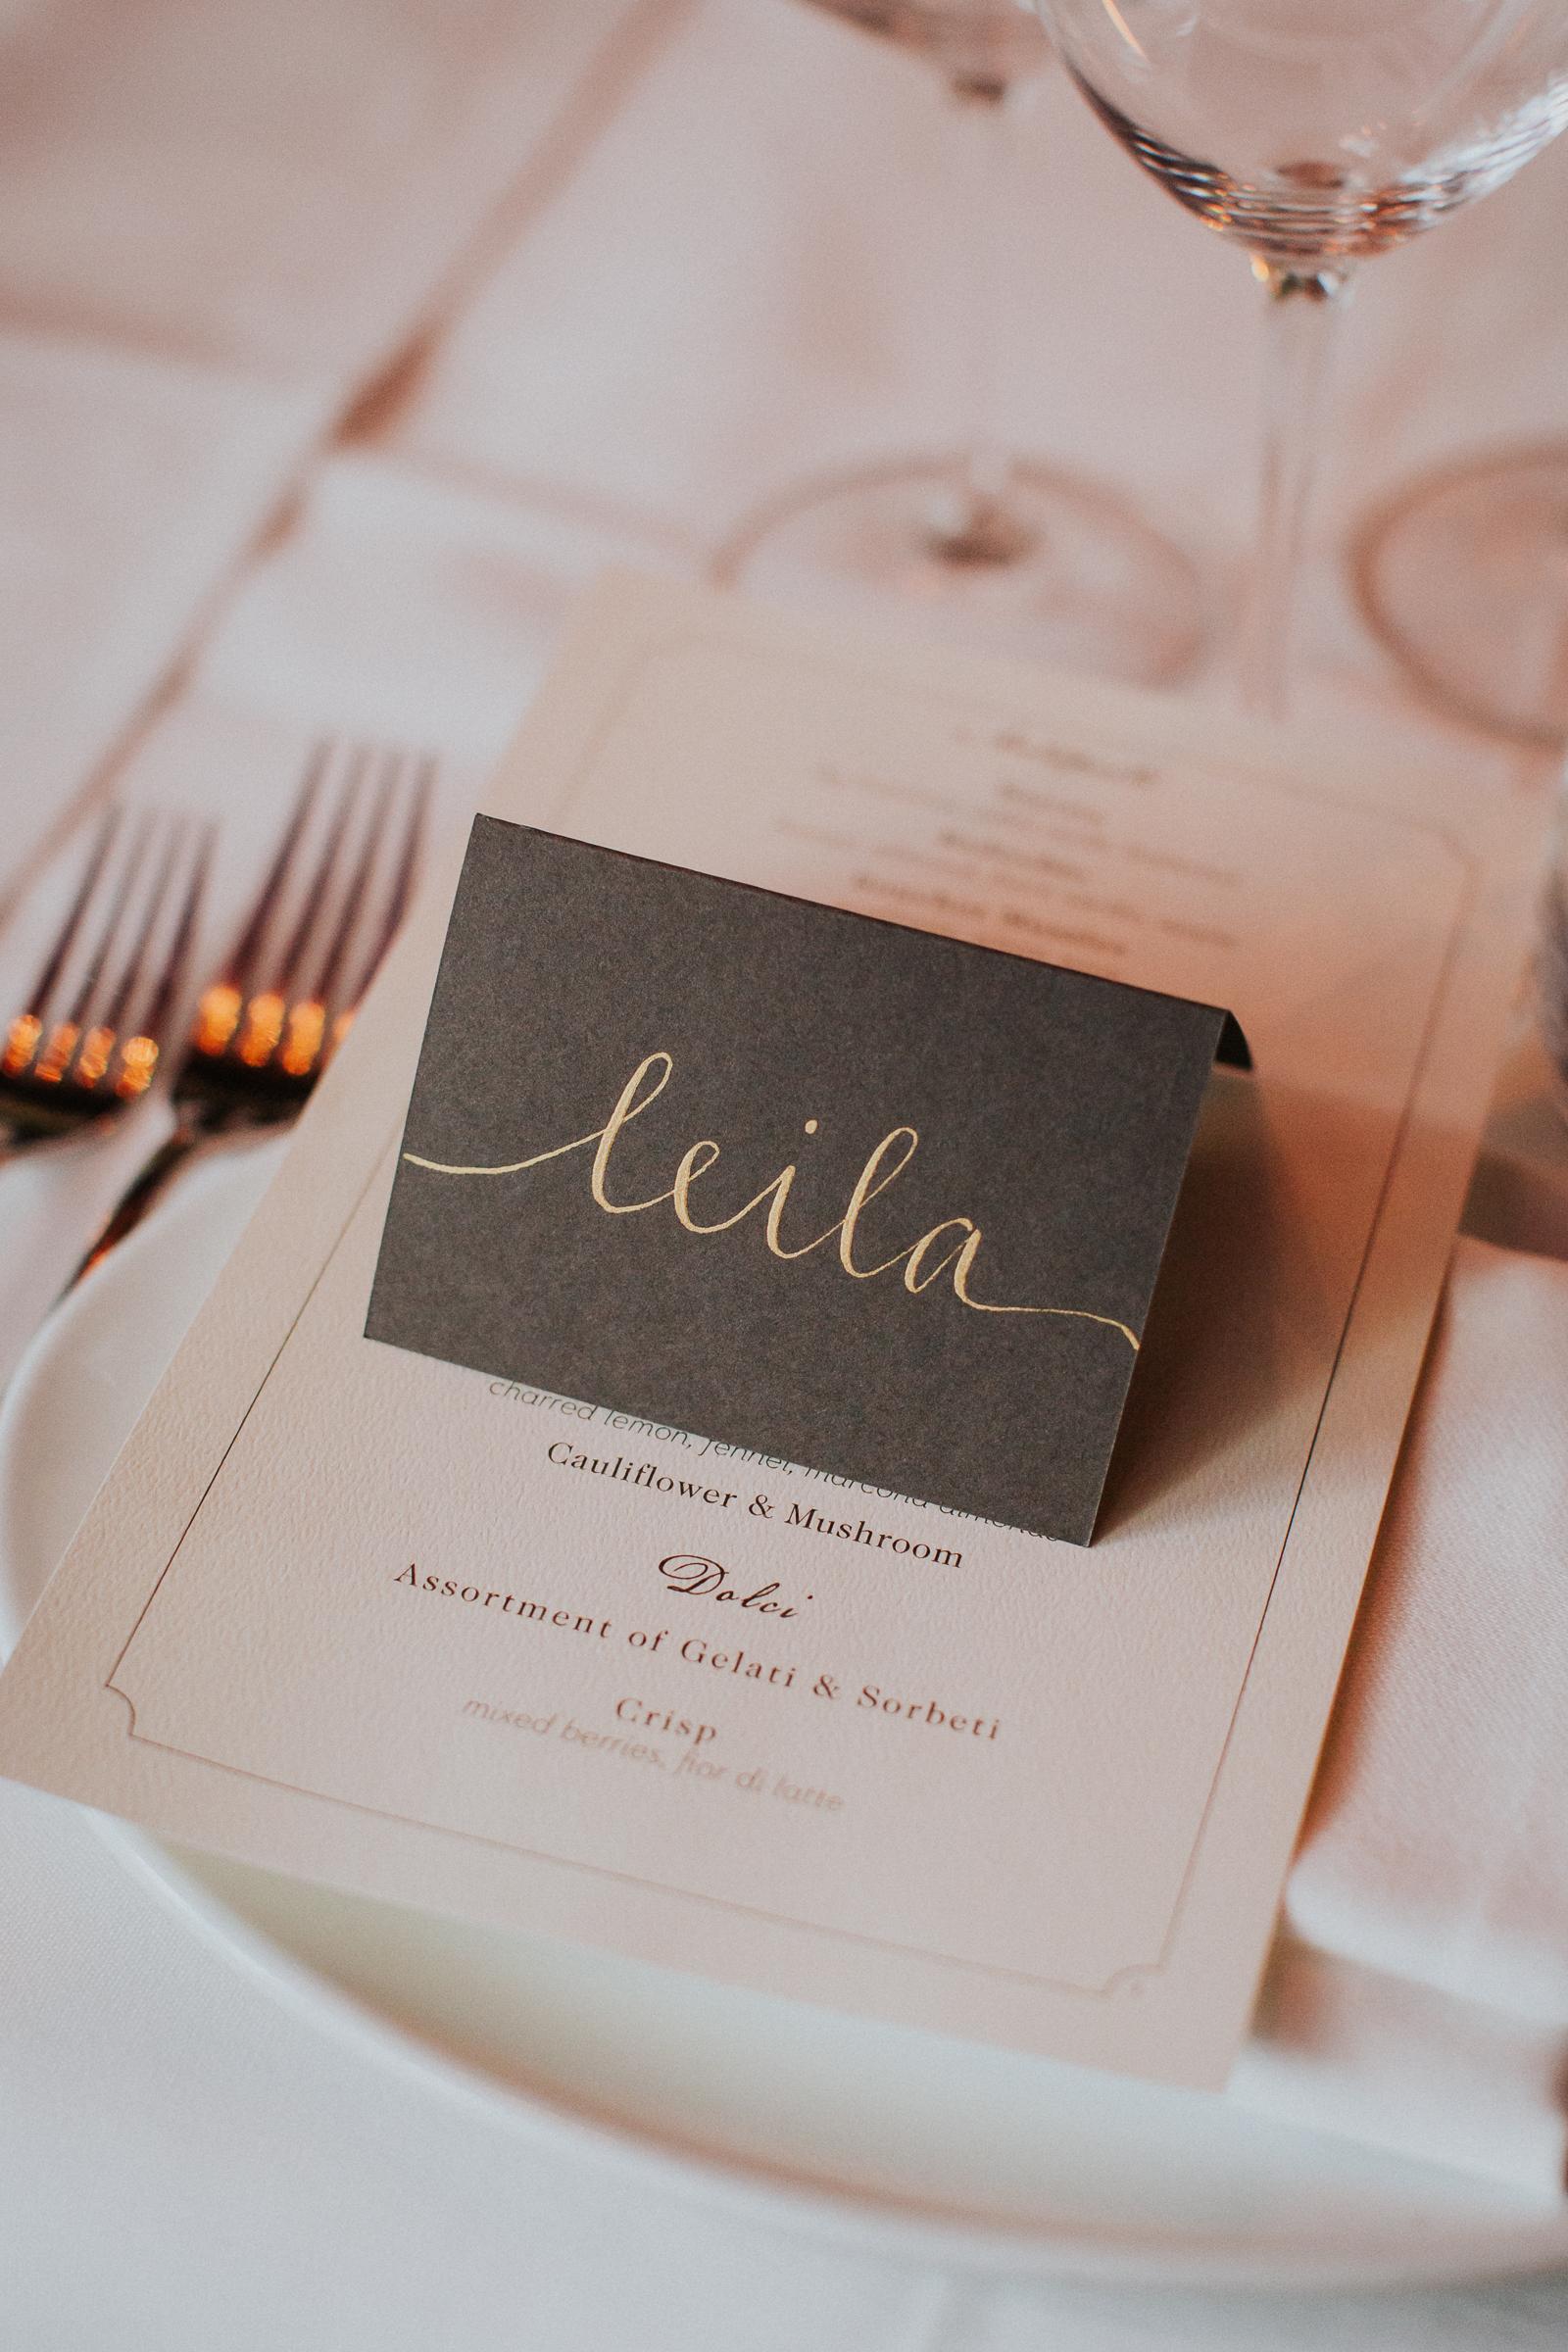 Casa-Apicii-Intimate-Wedding-City-Hall-Elopement-New-York-Documentary-Wedding-Photographer-46.jpg